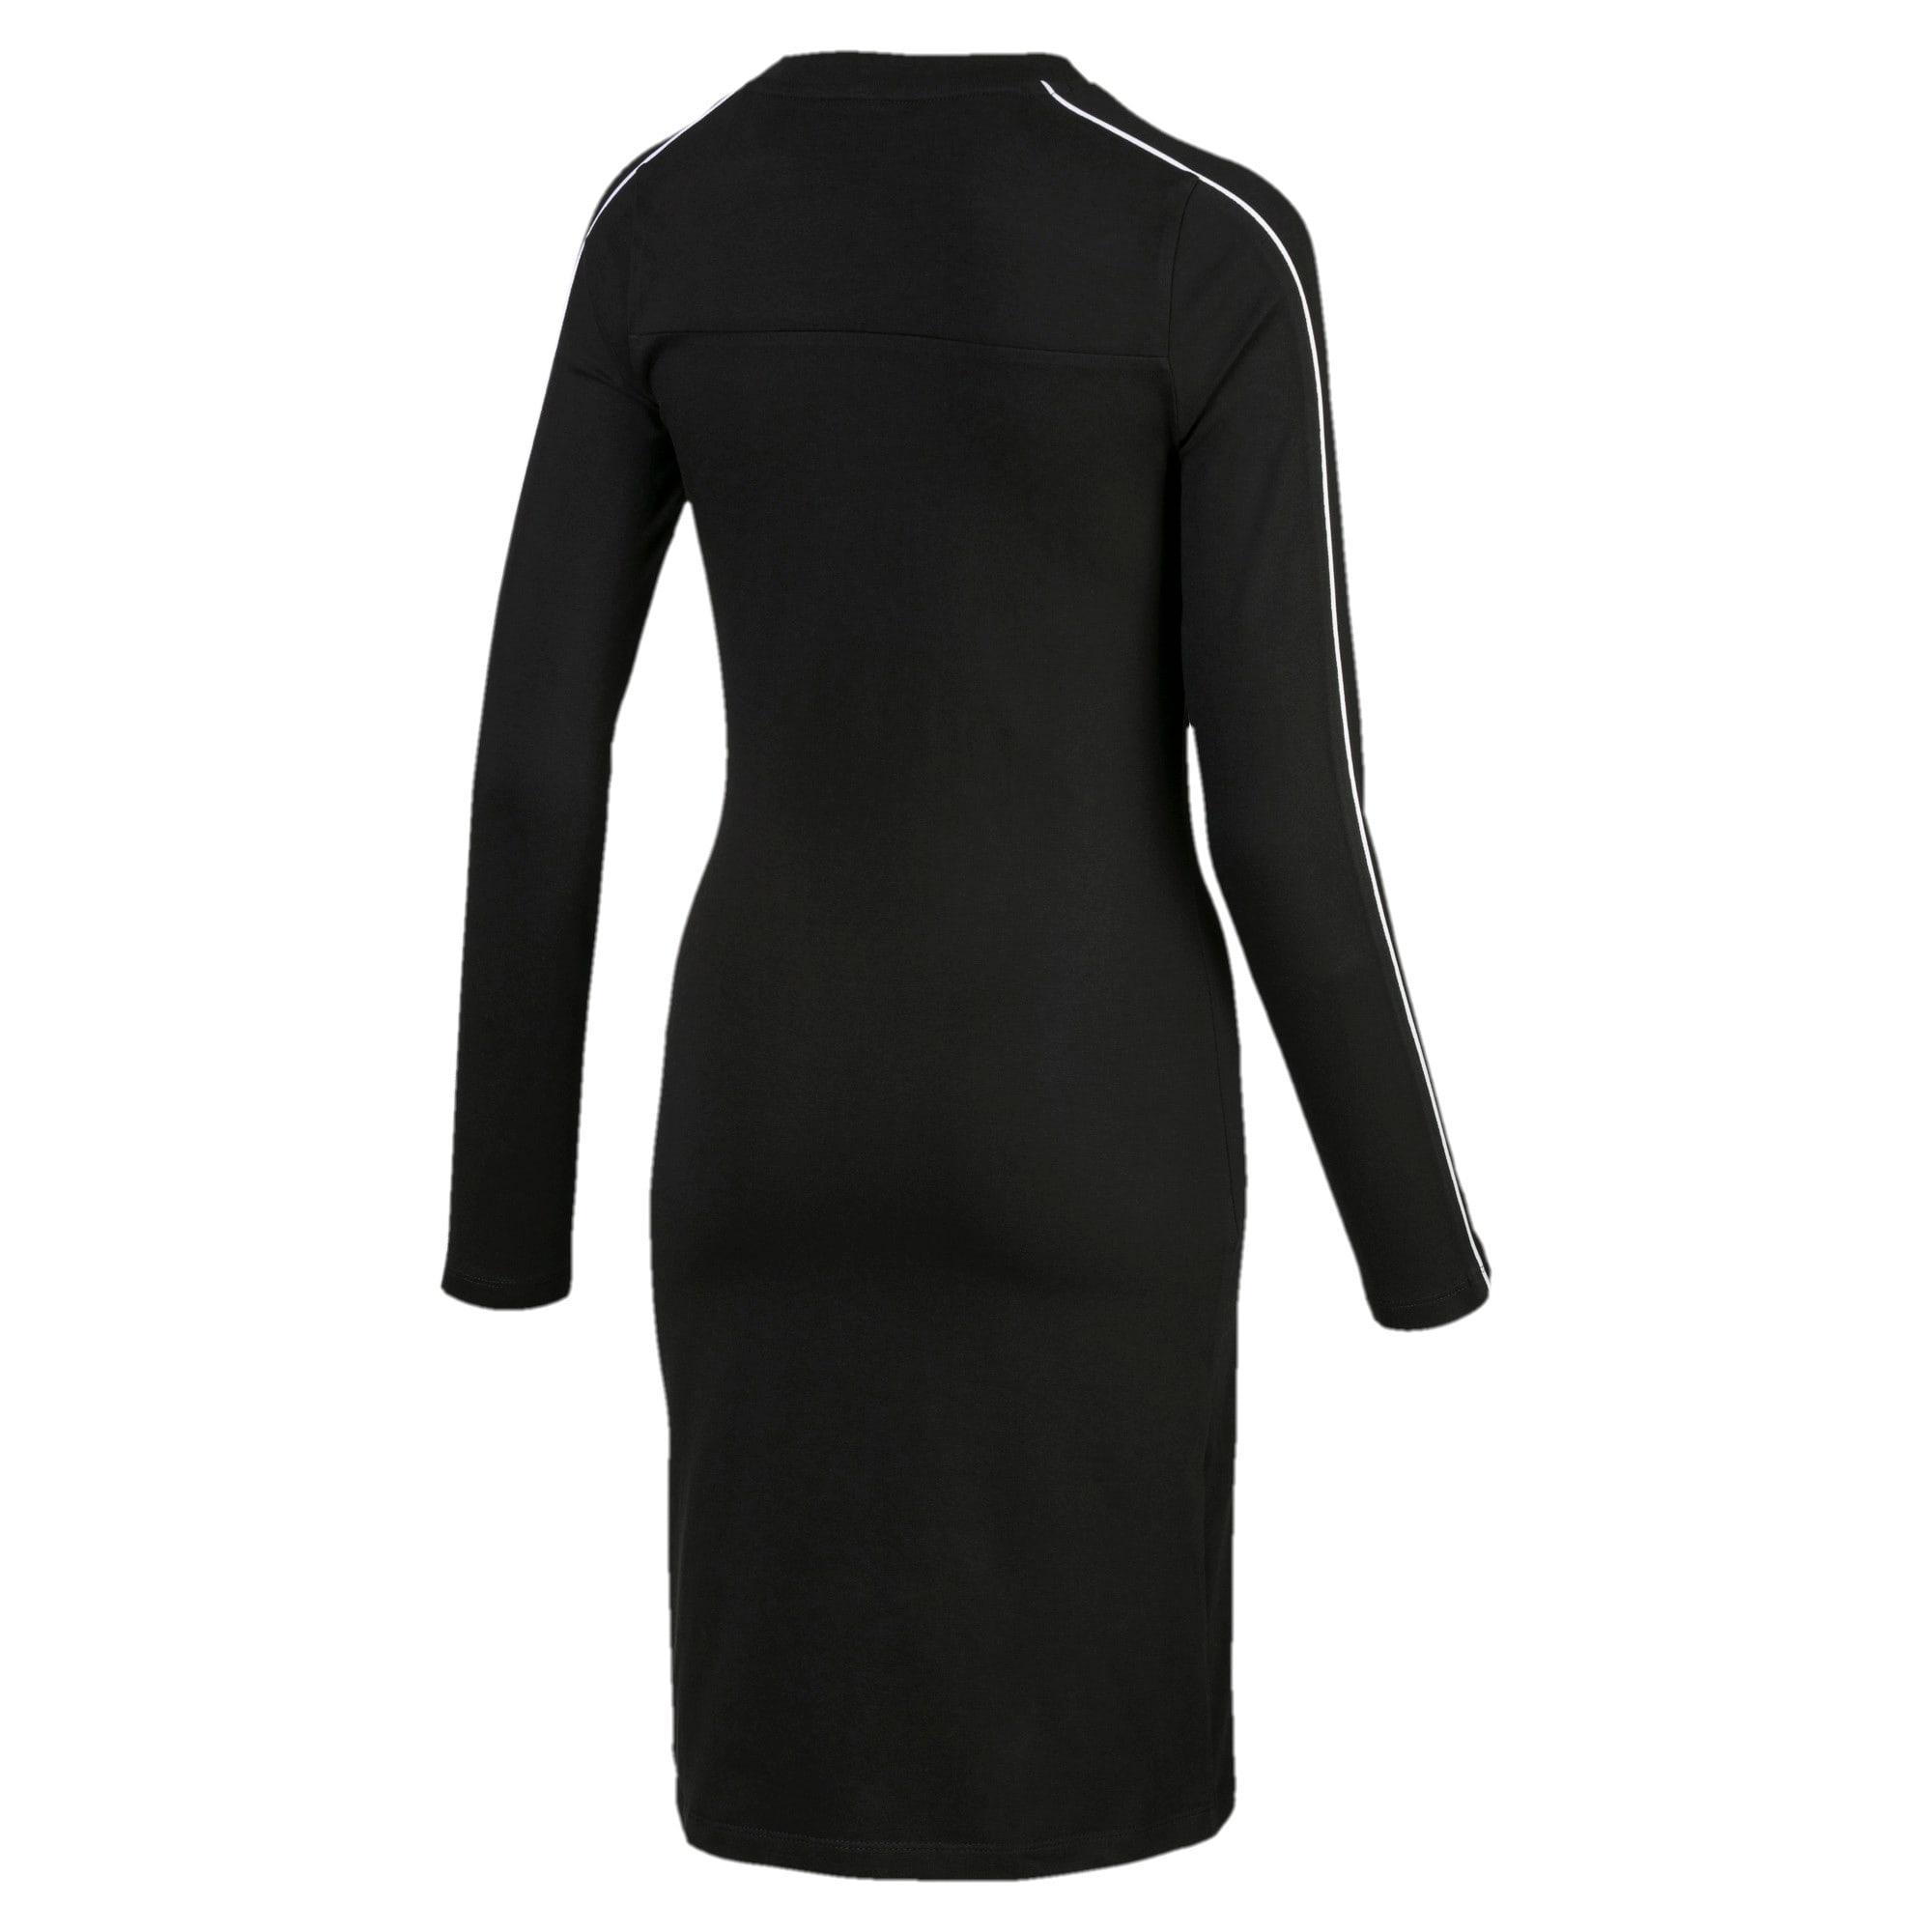 Thumbnail 5 of Classics Women's Dress, Puma Black, medium